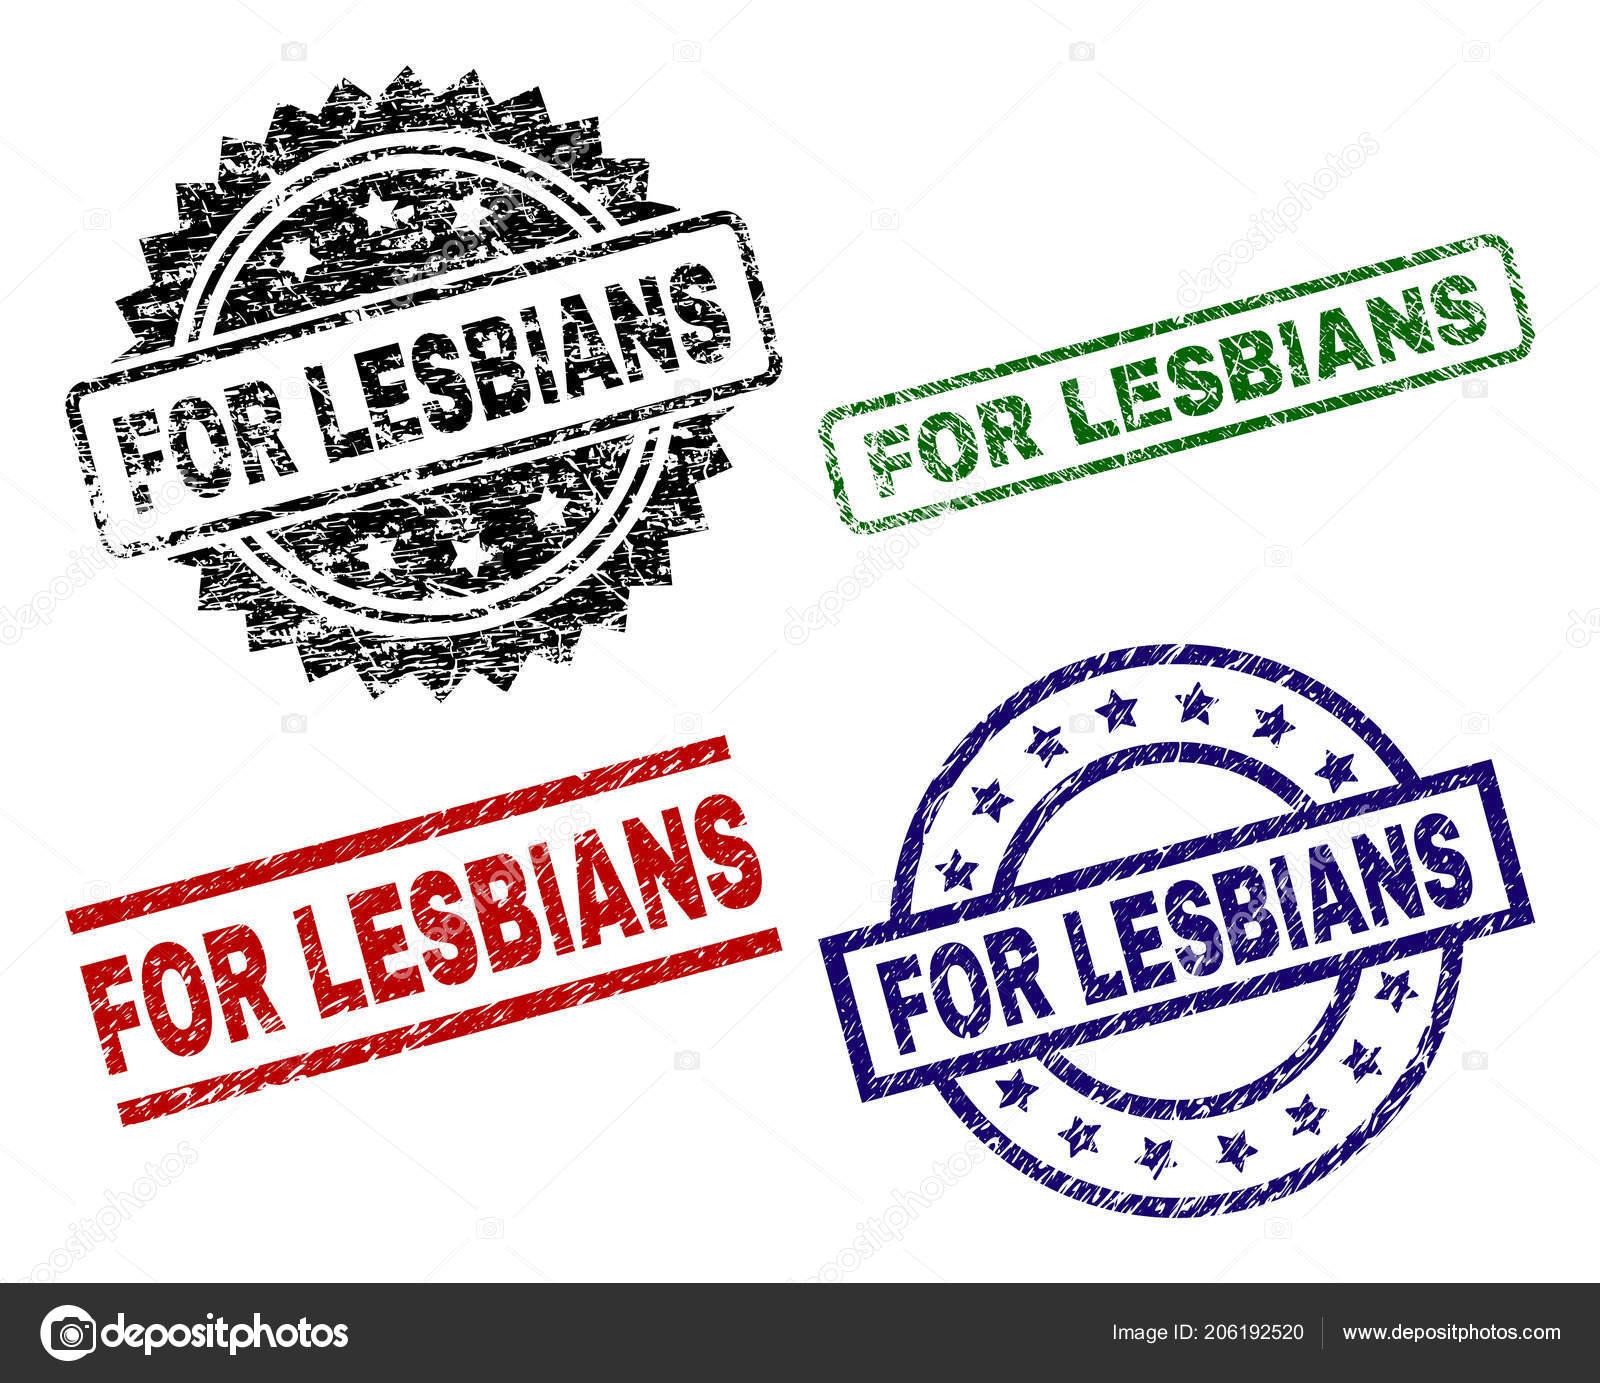 darmowe lesbiens gorące sex vdeos